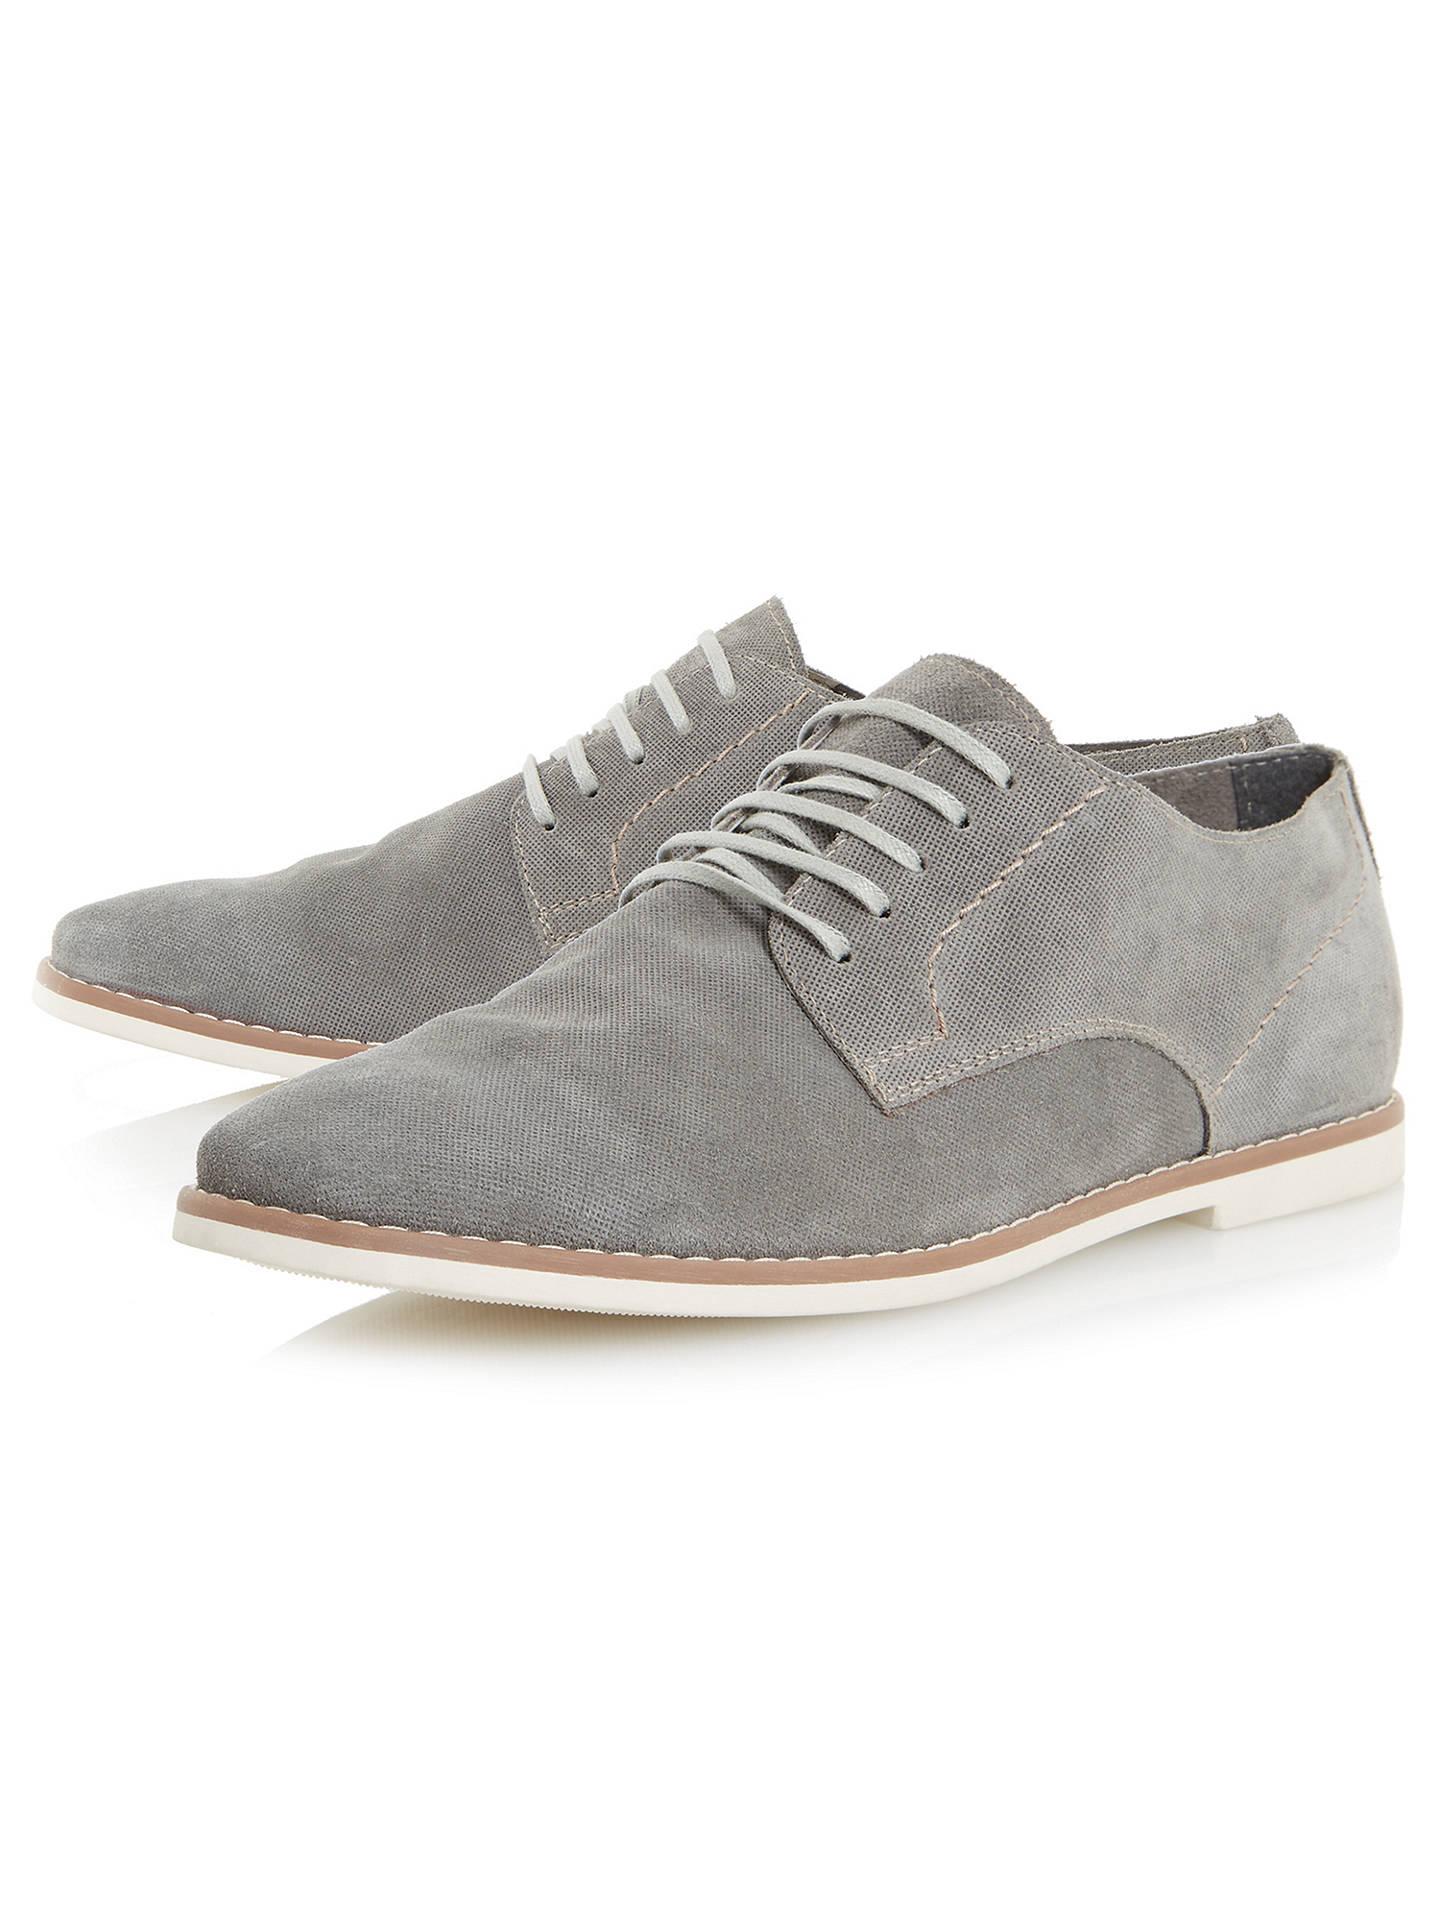 b28d7fe899442 ... Buy Bertie Basil Suede Derby Shoes, Grey, 6 Online at johnlewis.com